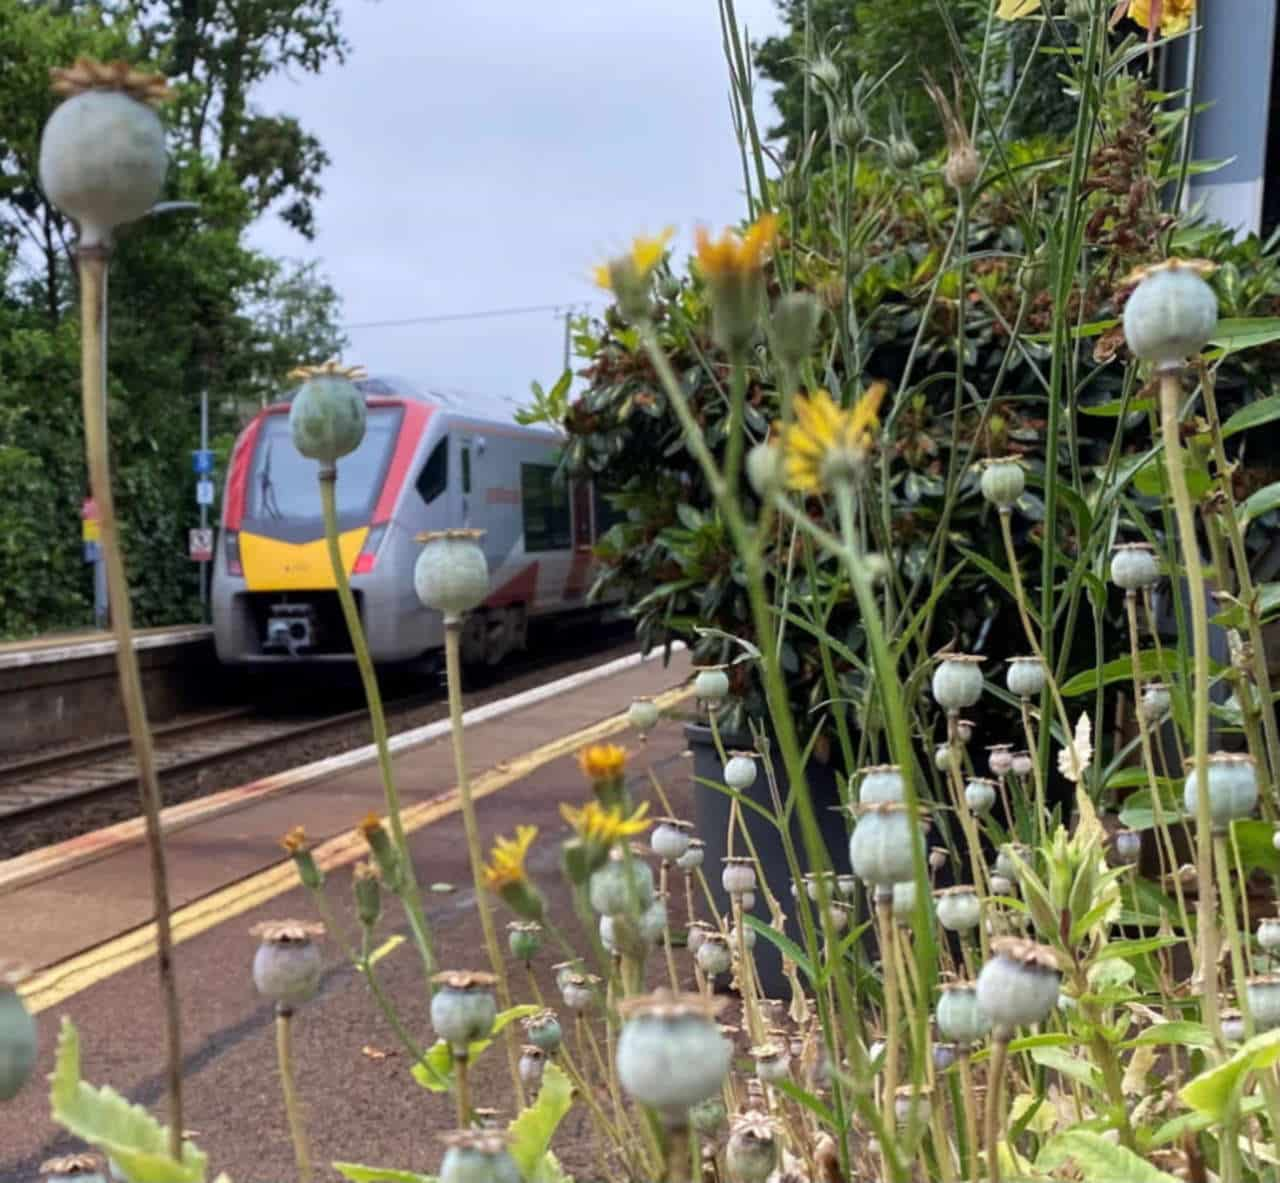 Brundall Gardens Station